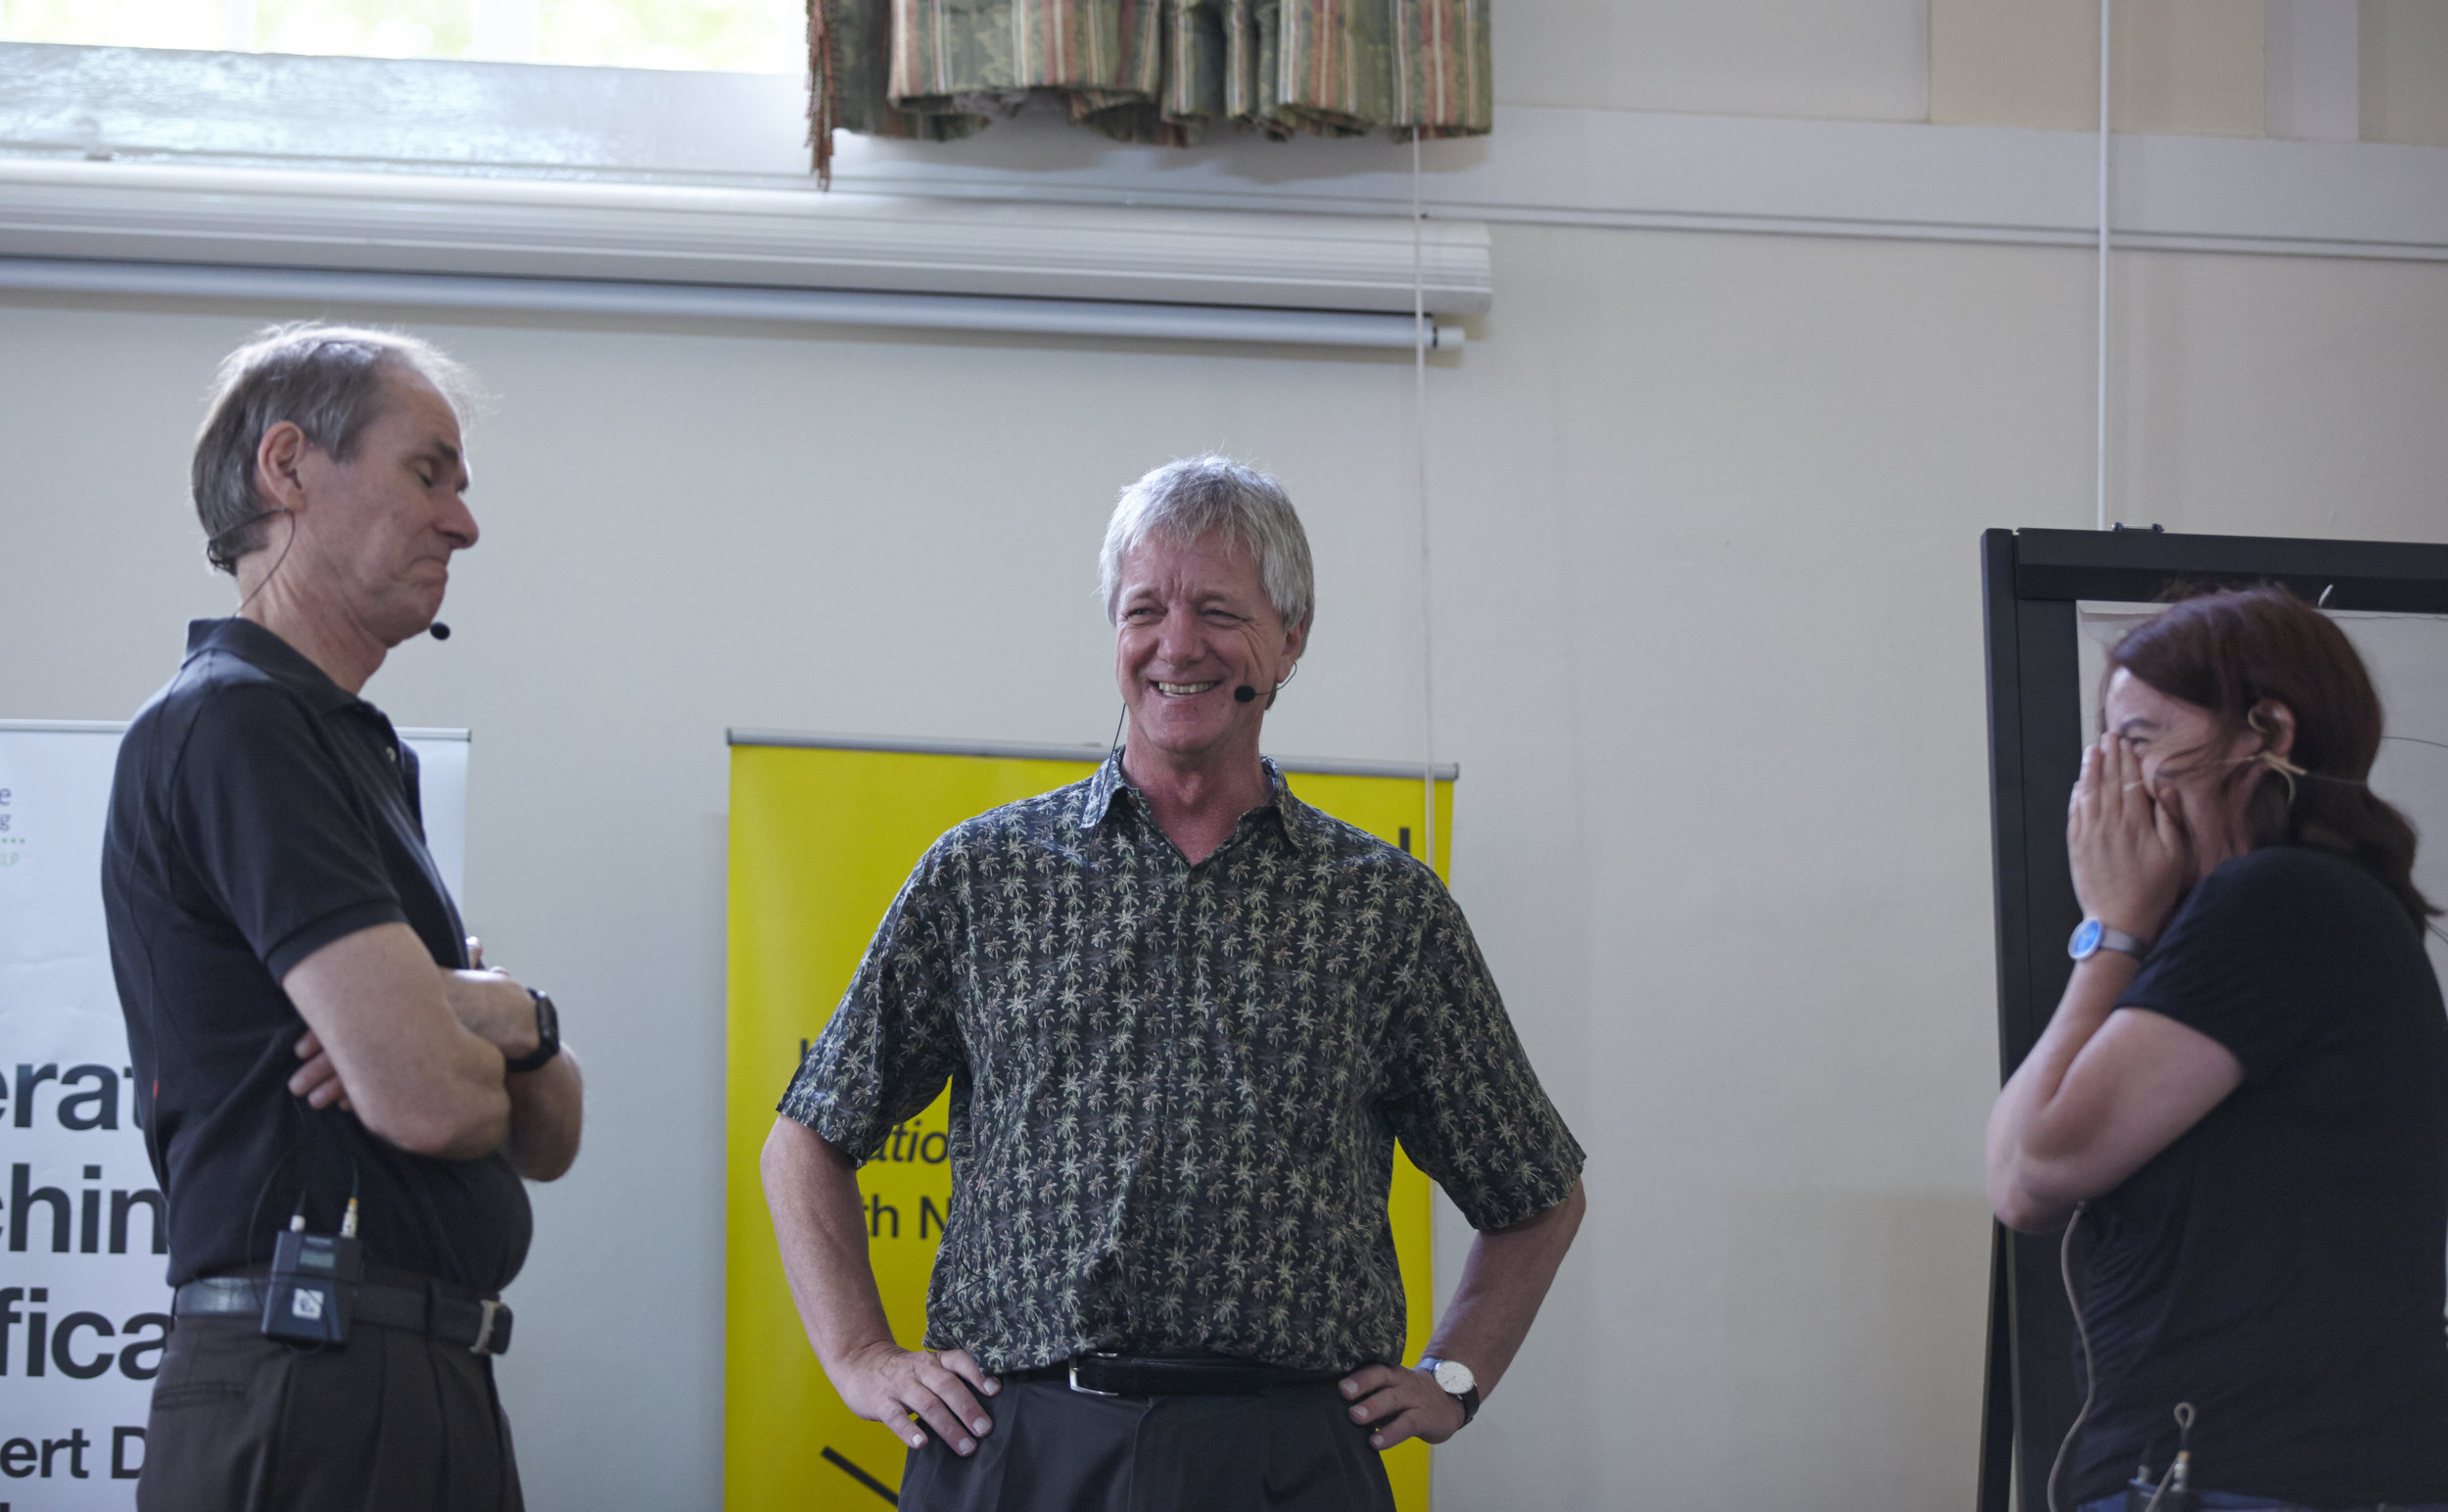 Steve Robert having fun with client.jpg